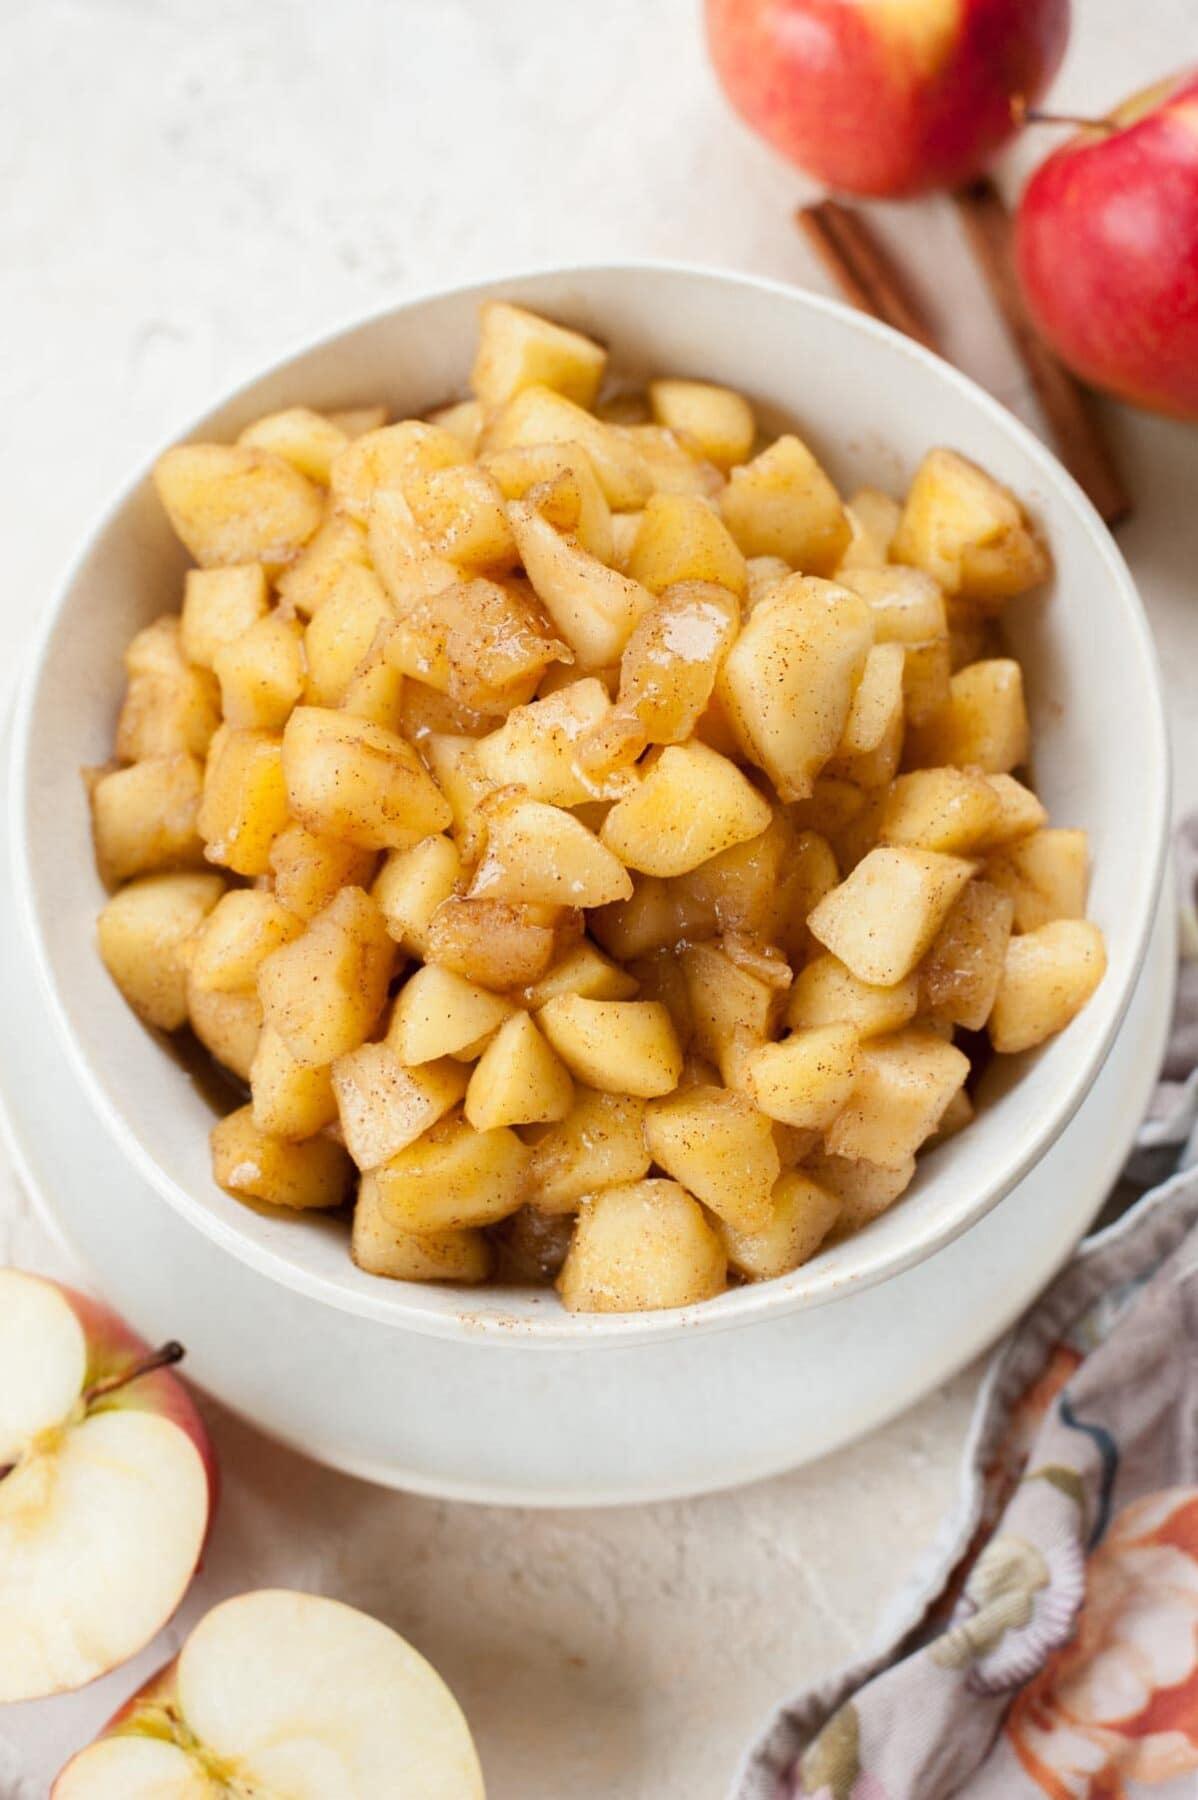 Sautéed Cinnamon Apples in a white bowl.